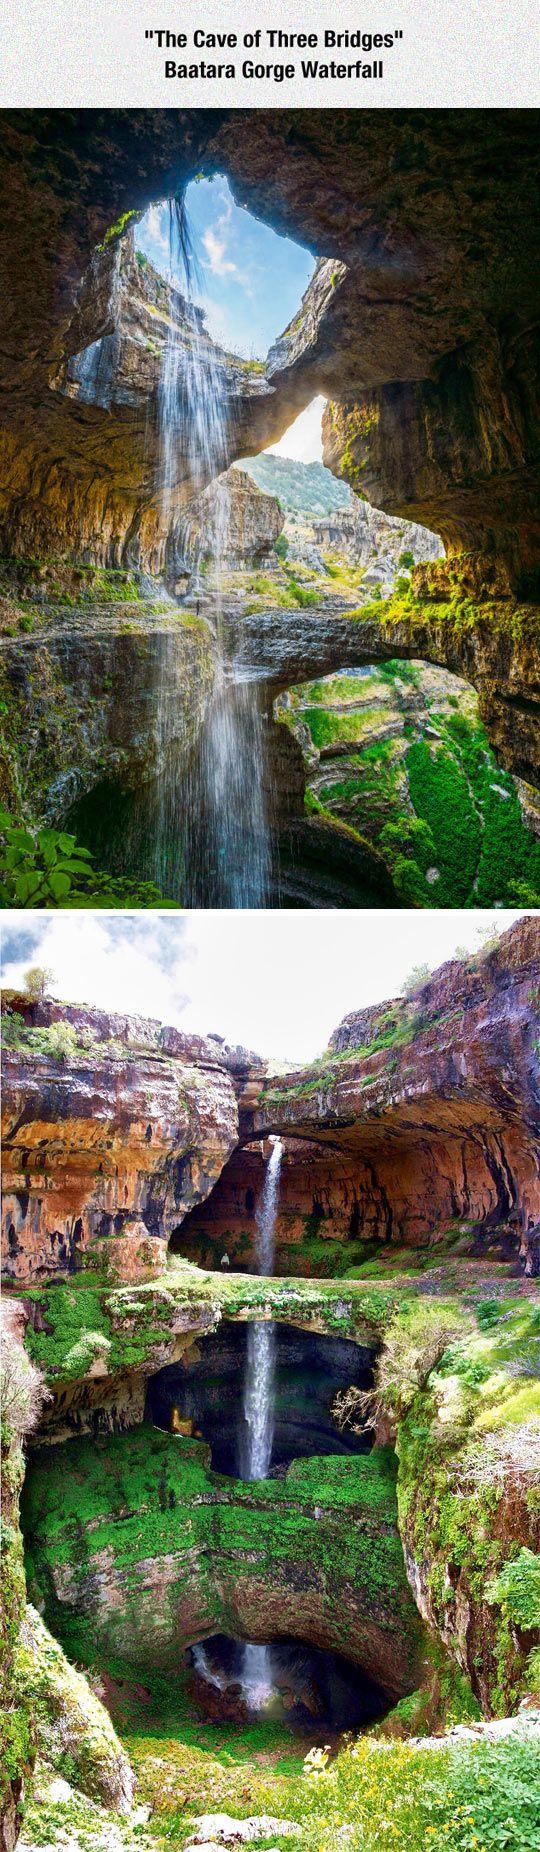 The Wonderful Cave Of Three Bridges - The Meta Picture